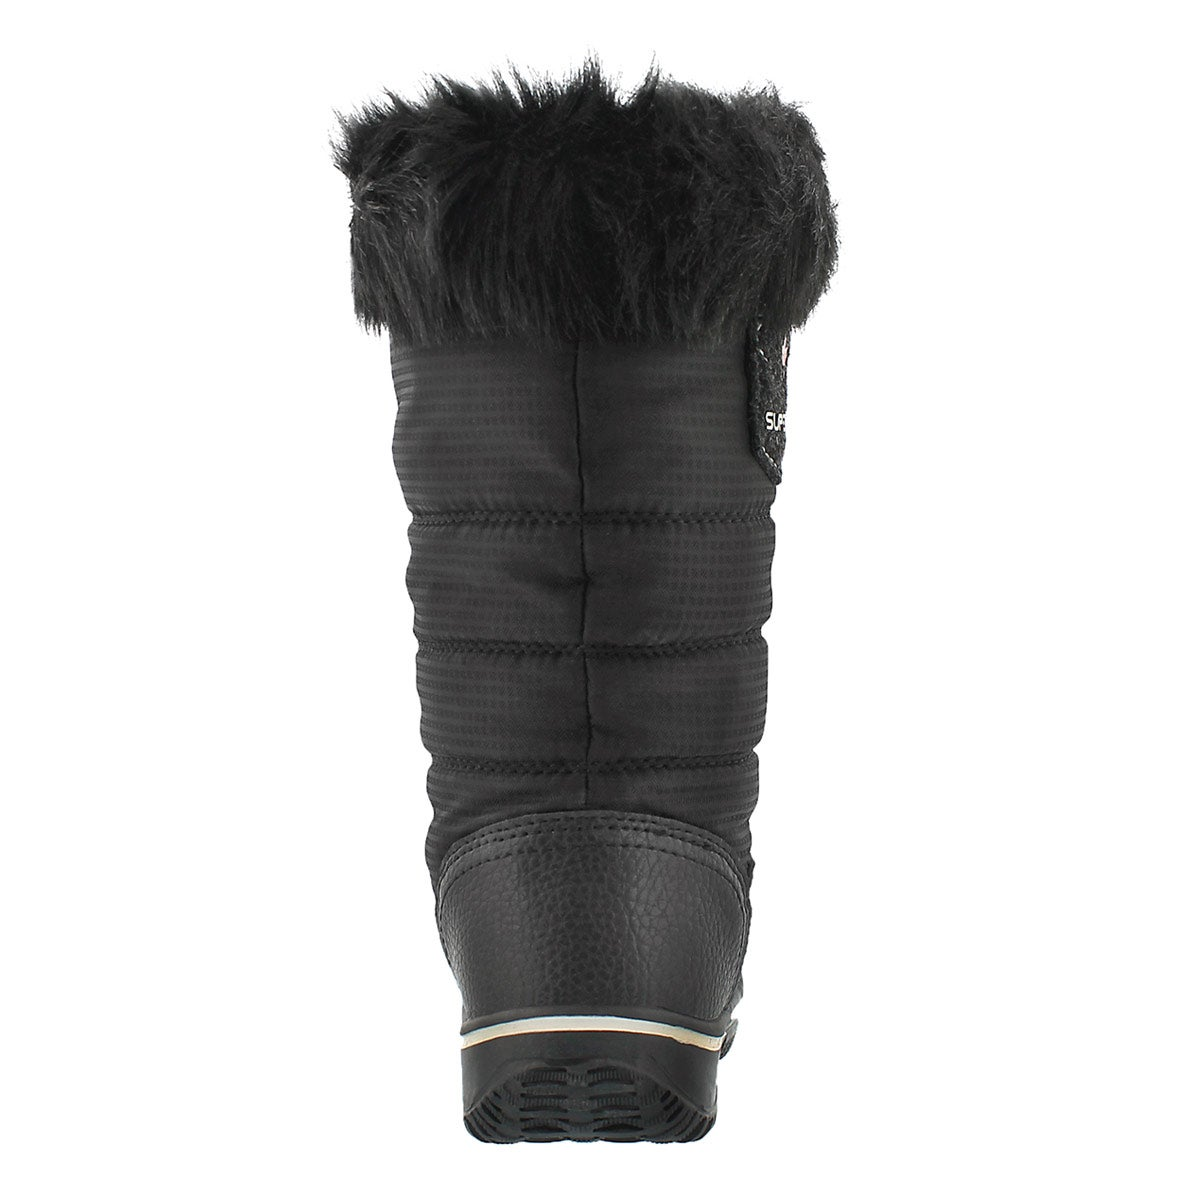 Grls Ukina blk wtrpf winter boot